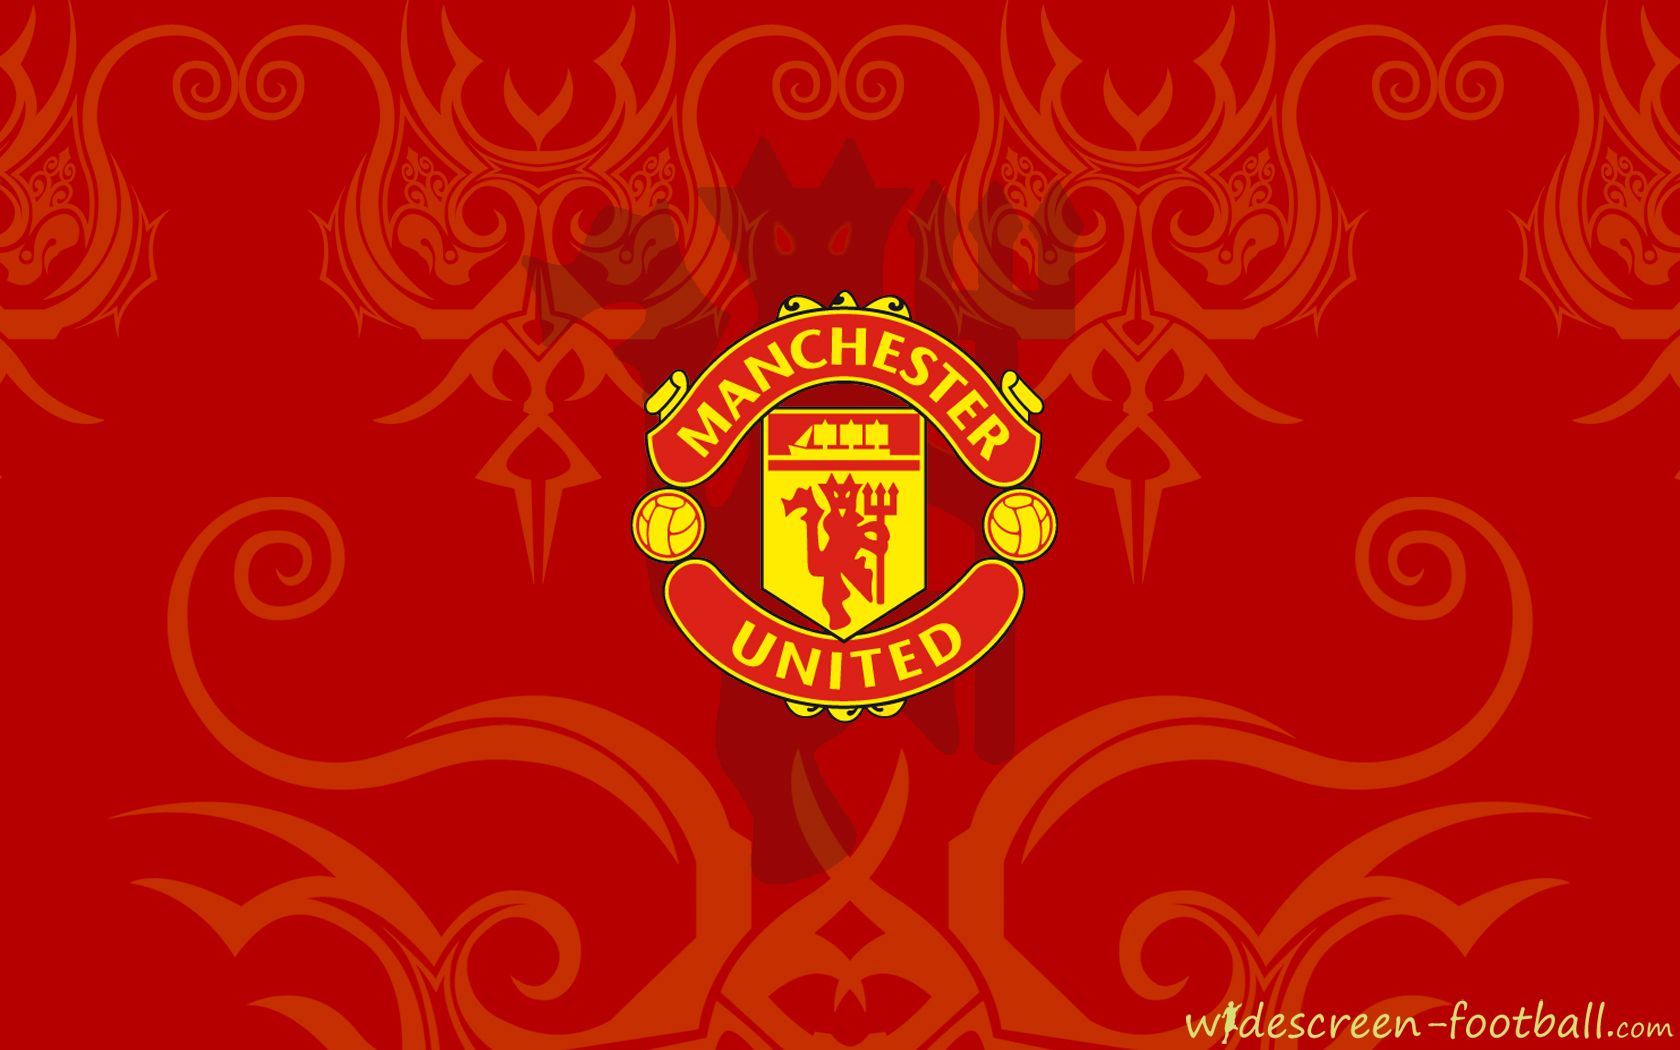 9c3e76a72ec2b44290b12cc9372ae57f Large Jpeg 1680 1050 Kagawa Manchester United Manchester